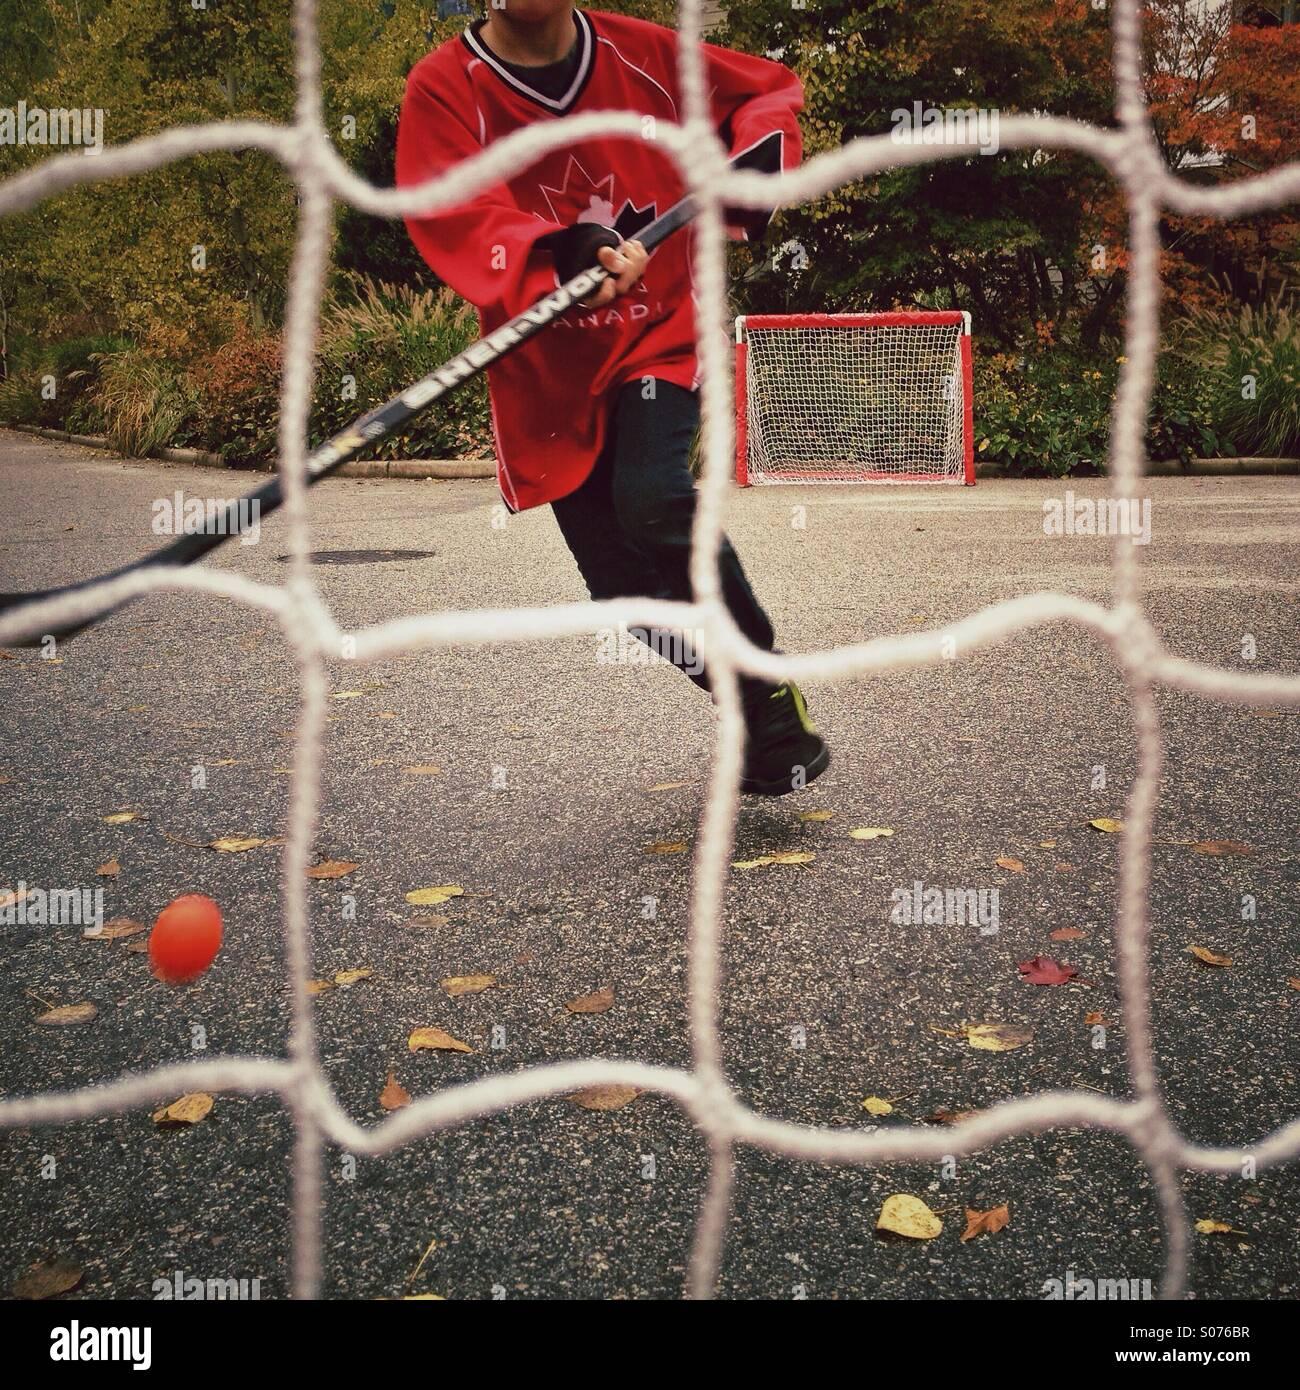 Boy playing street hockey - Stock Image